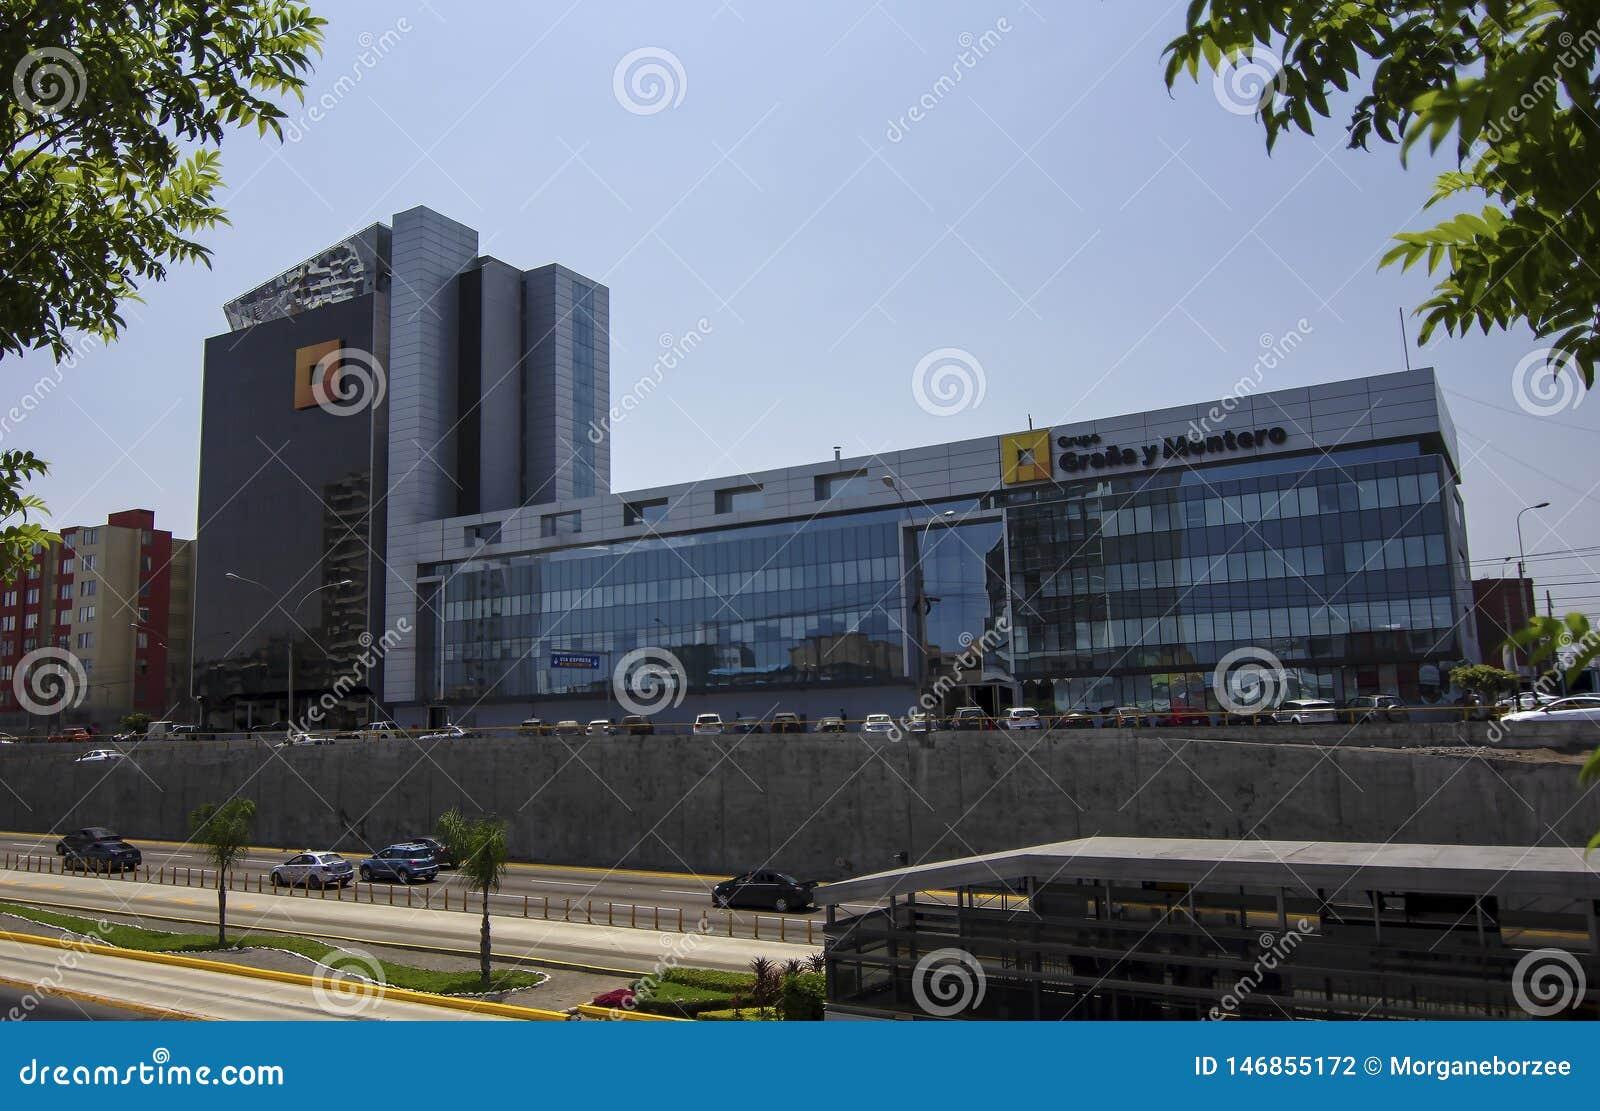 Graña y蒙特罗,建筑和工程学商业公司